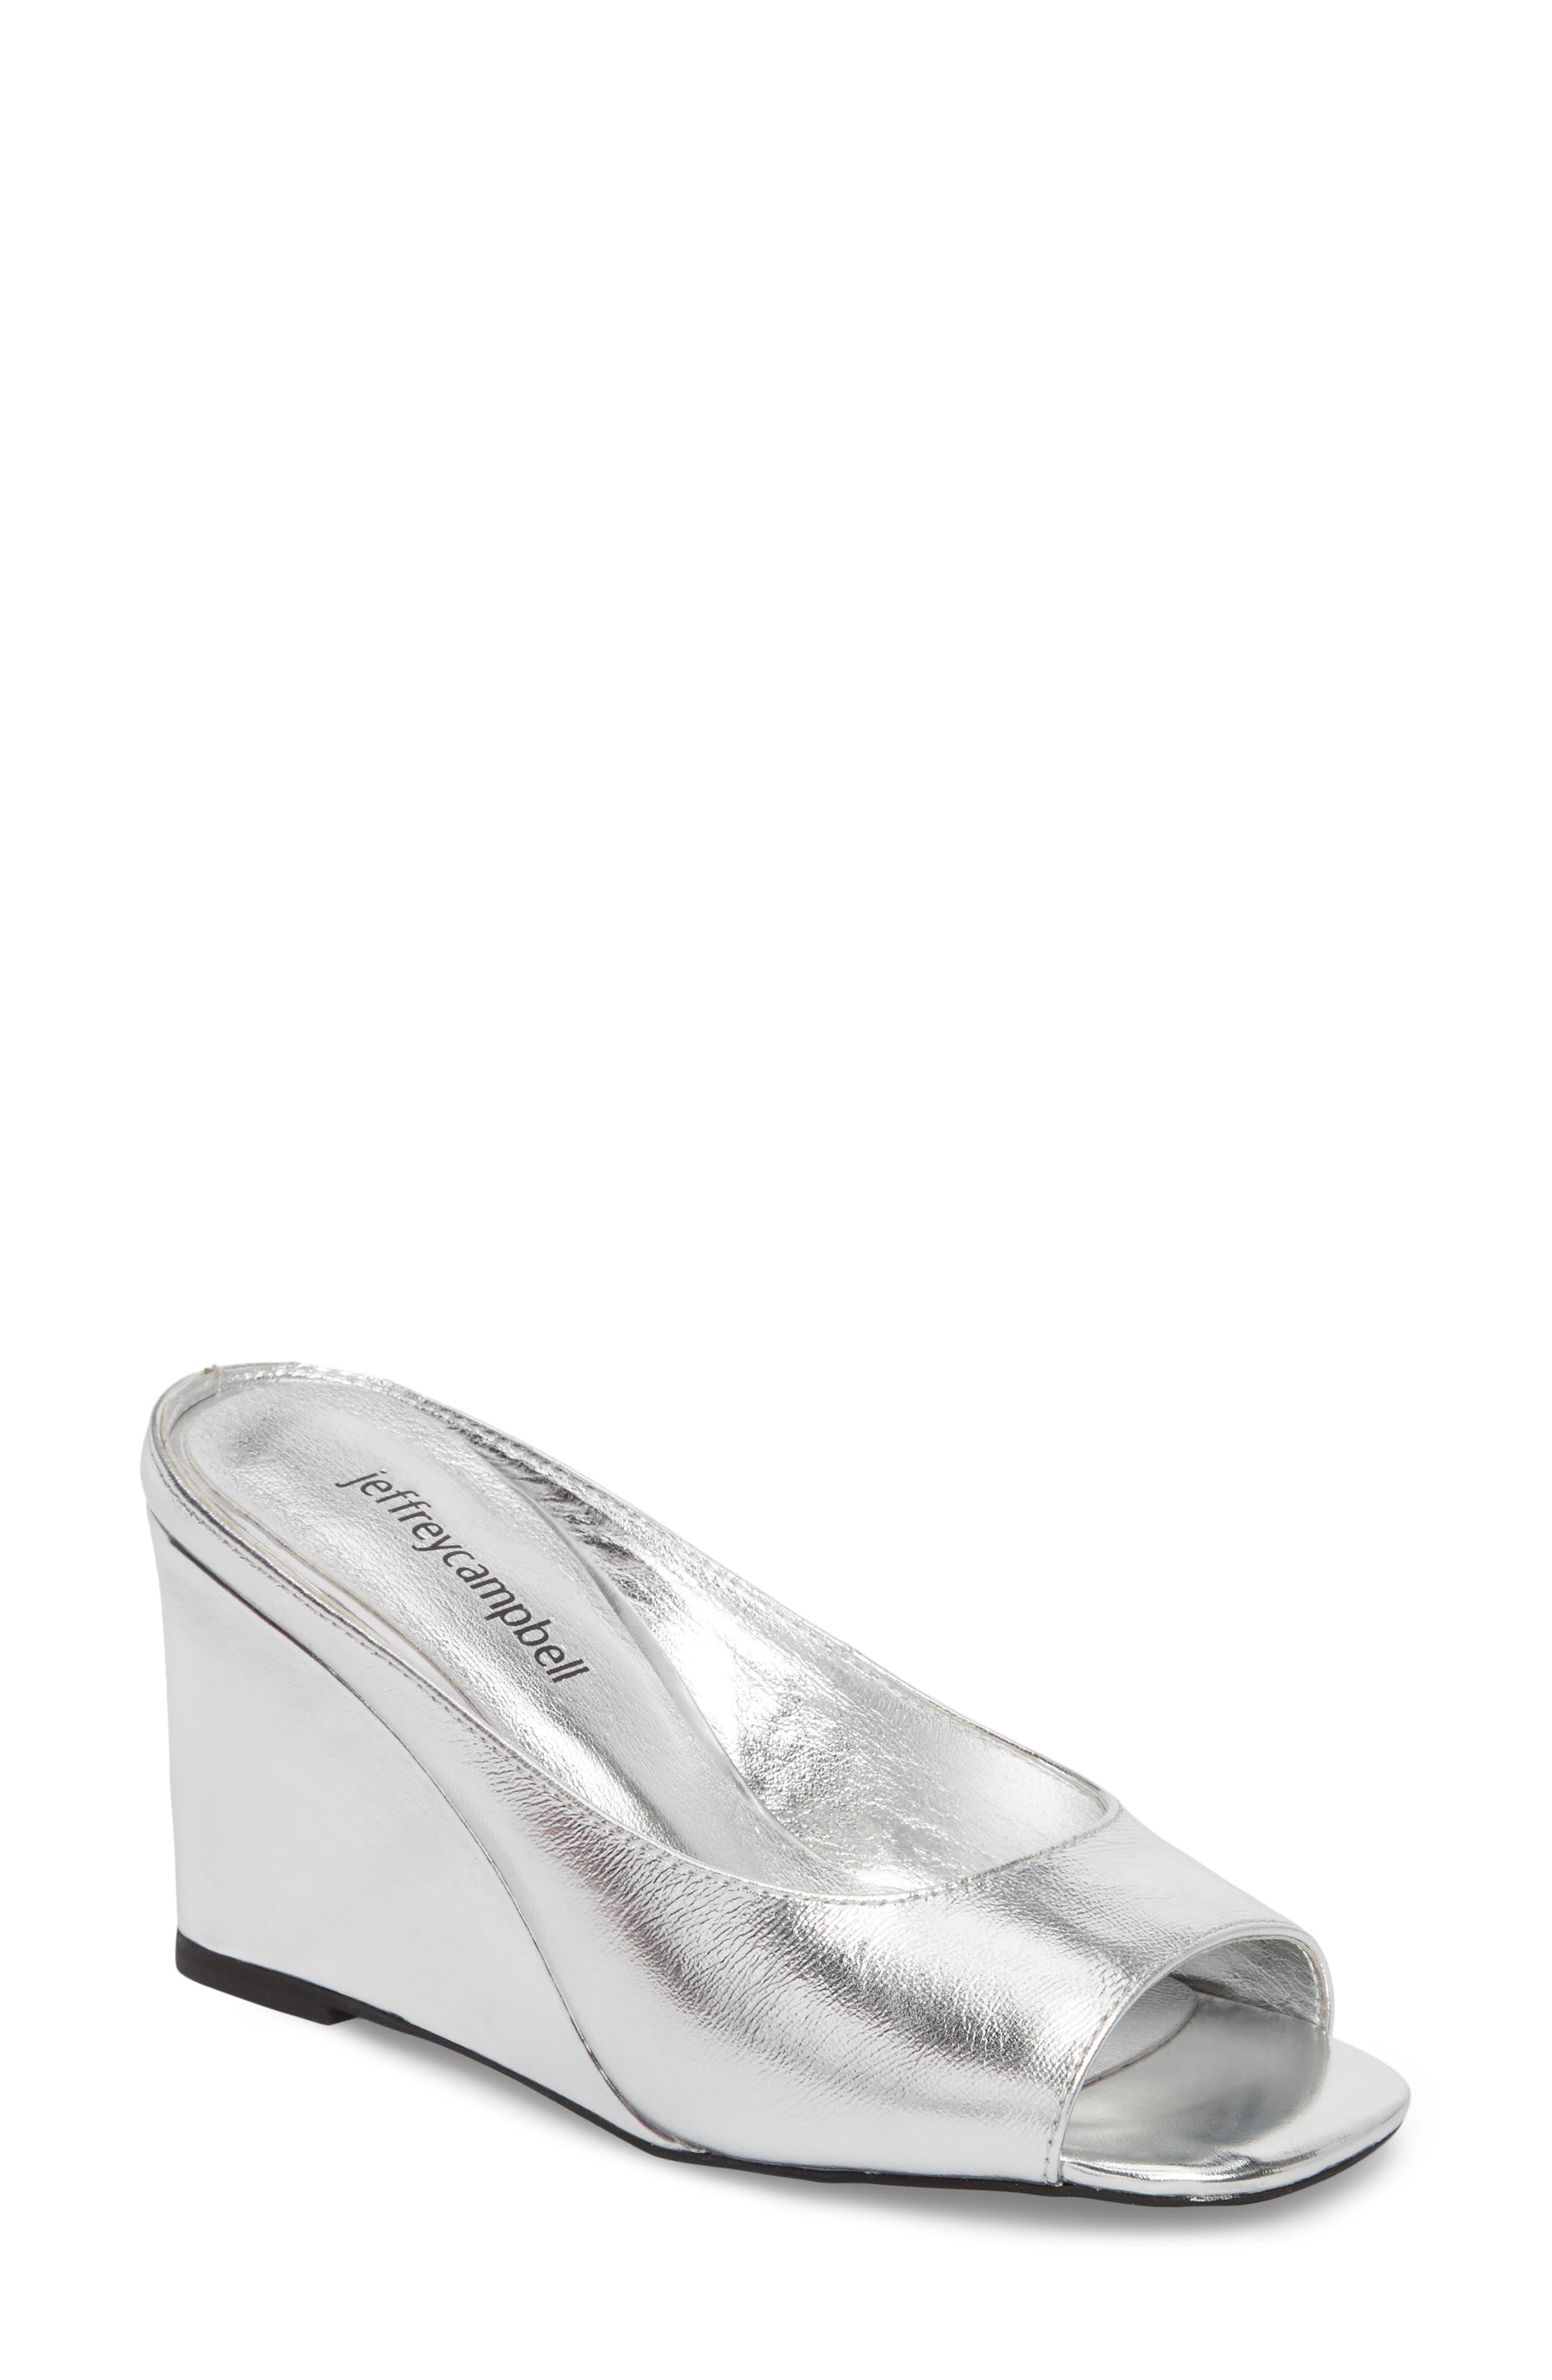 Alternate Image 1 Selected - Jeffrey Campbell Generous Wedge Sandal (Women)